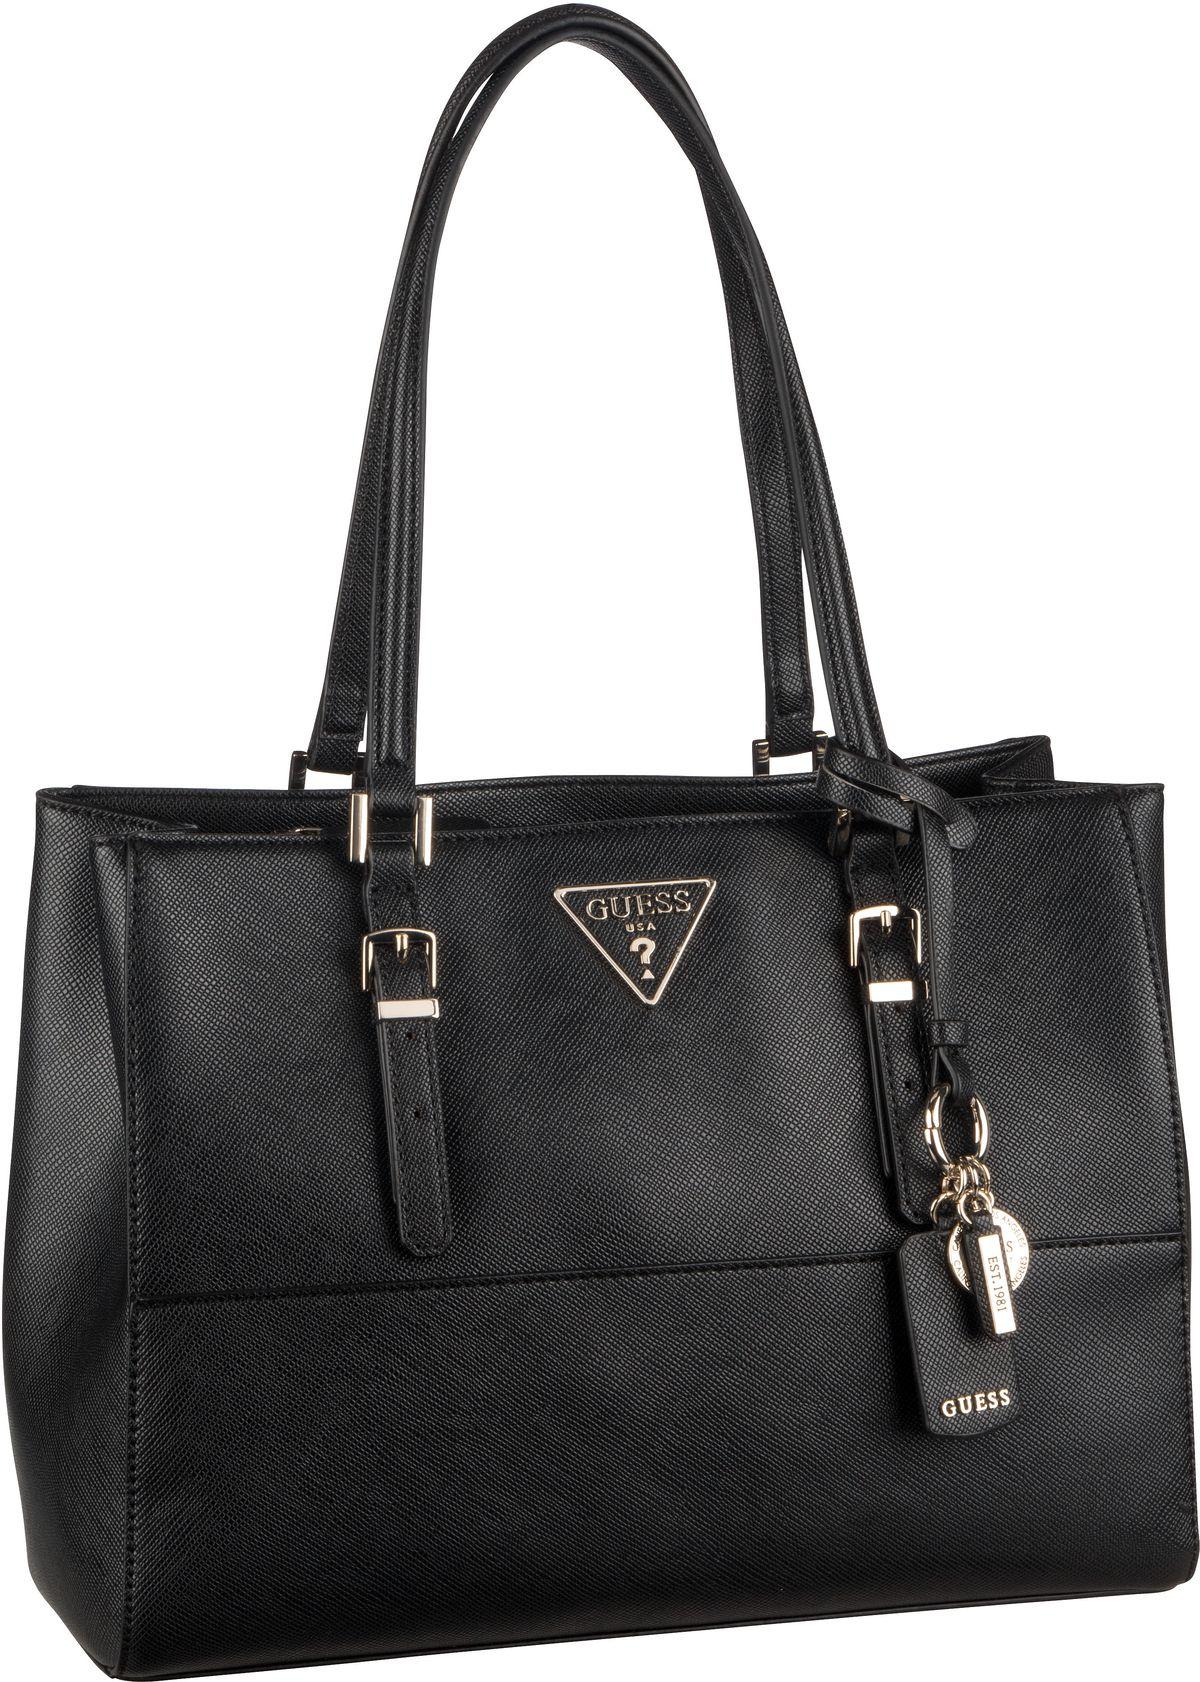 Handtasche Carys Carryall Black